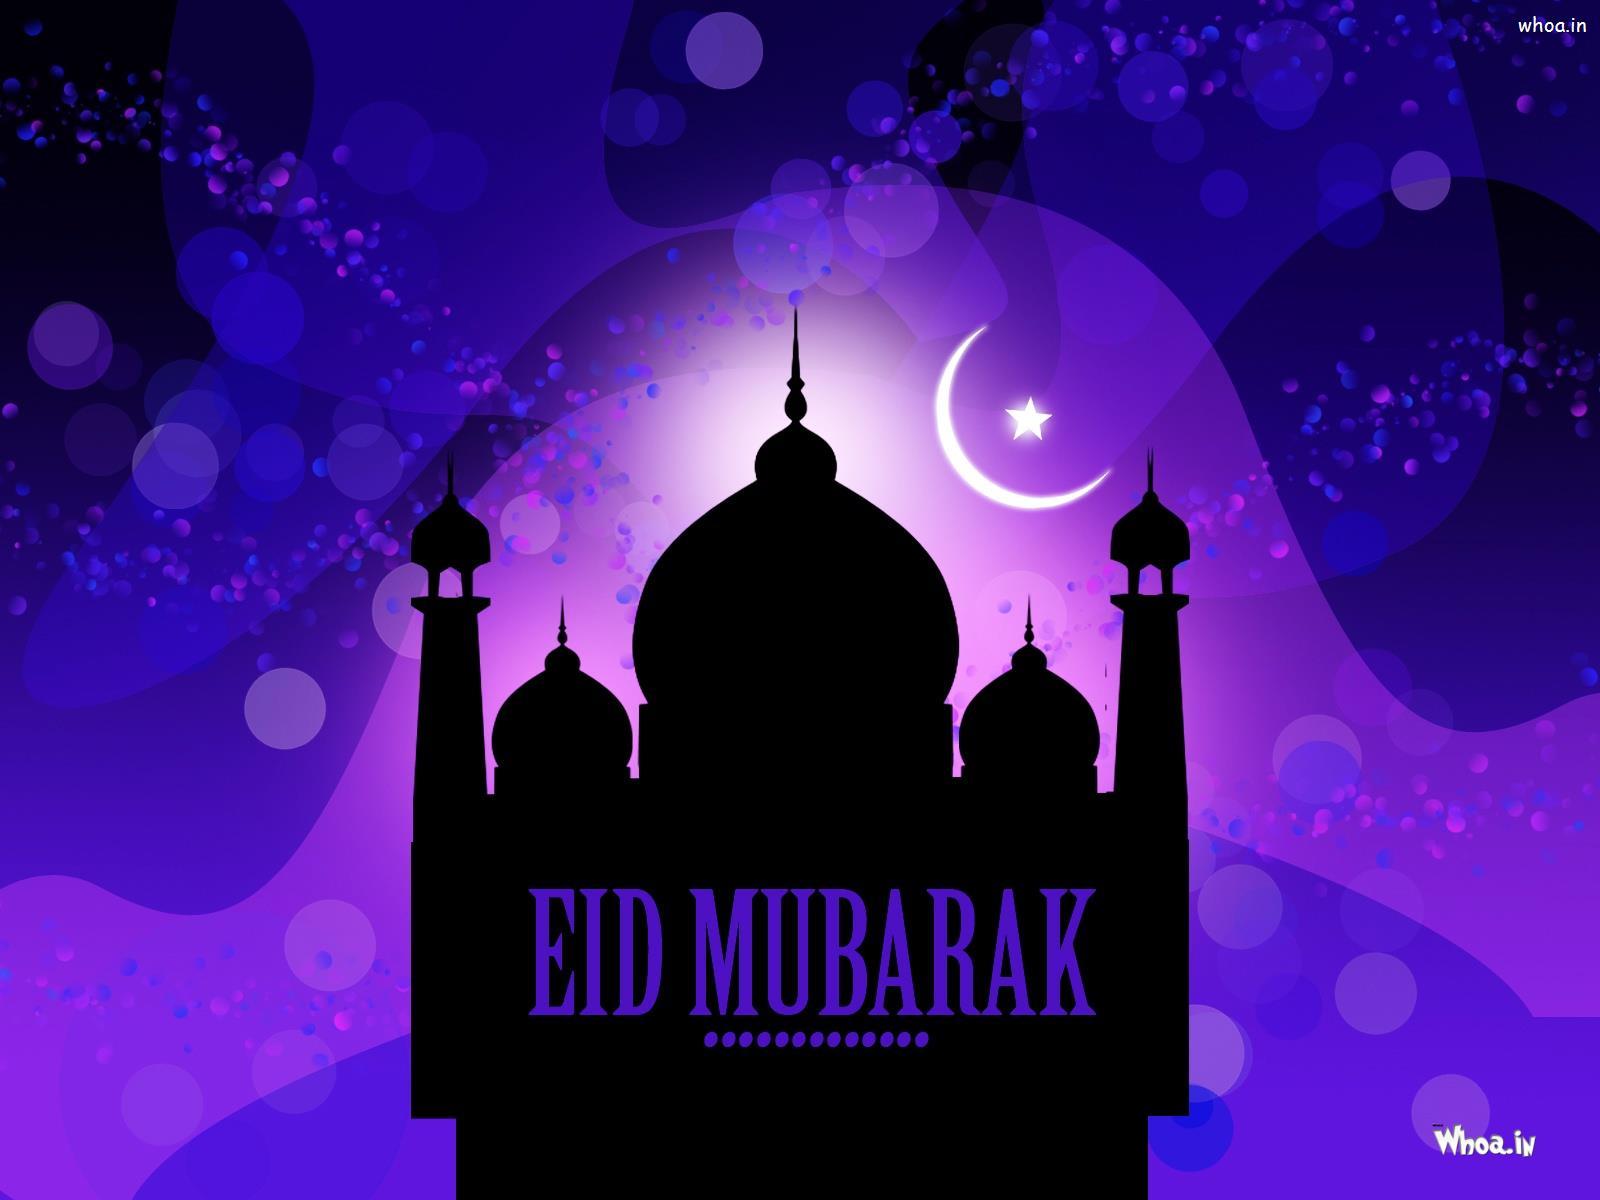 Hd wallpaper eid mubarak - Hd Wallpaper Eid Mubarak 80